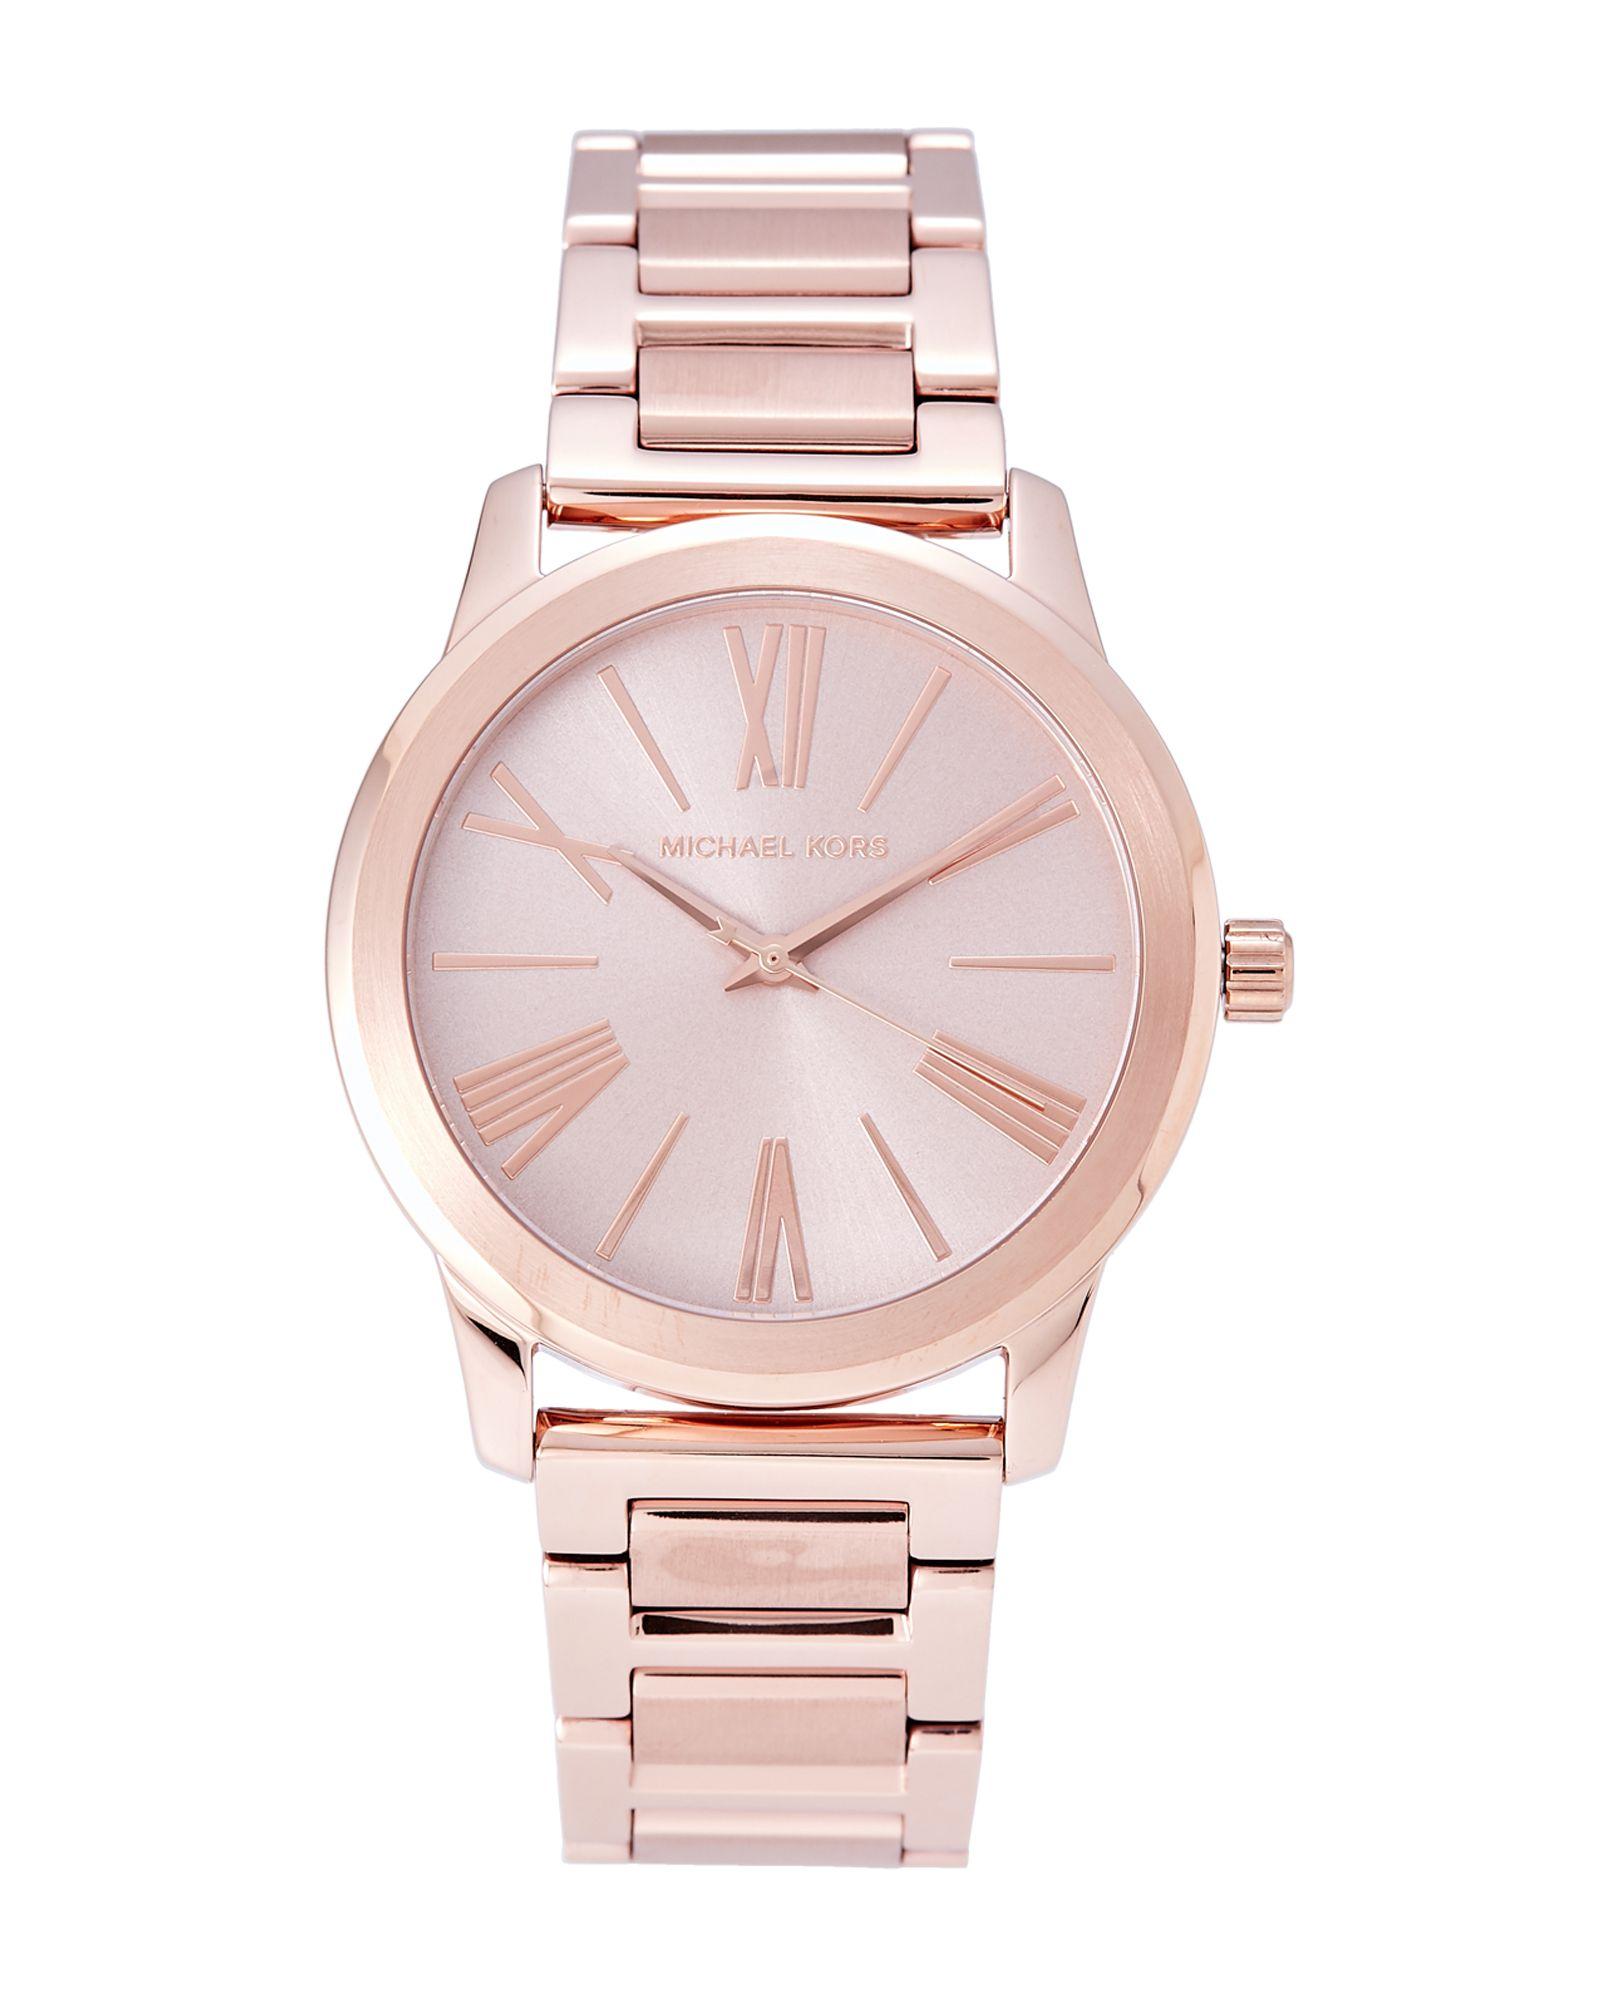 fb891a233805 Michael Kors MK3491 Rose Gold-Tone Watch